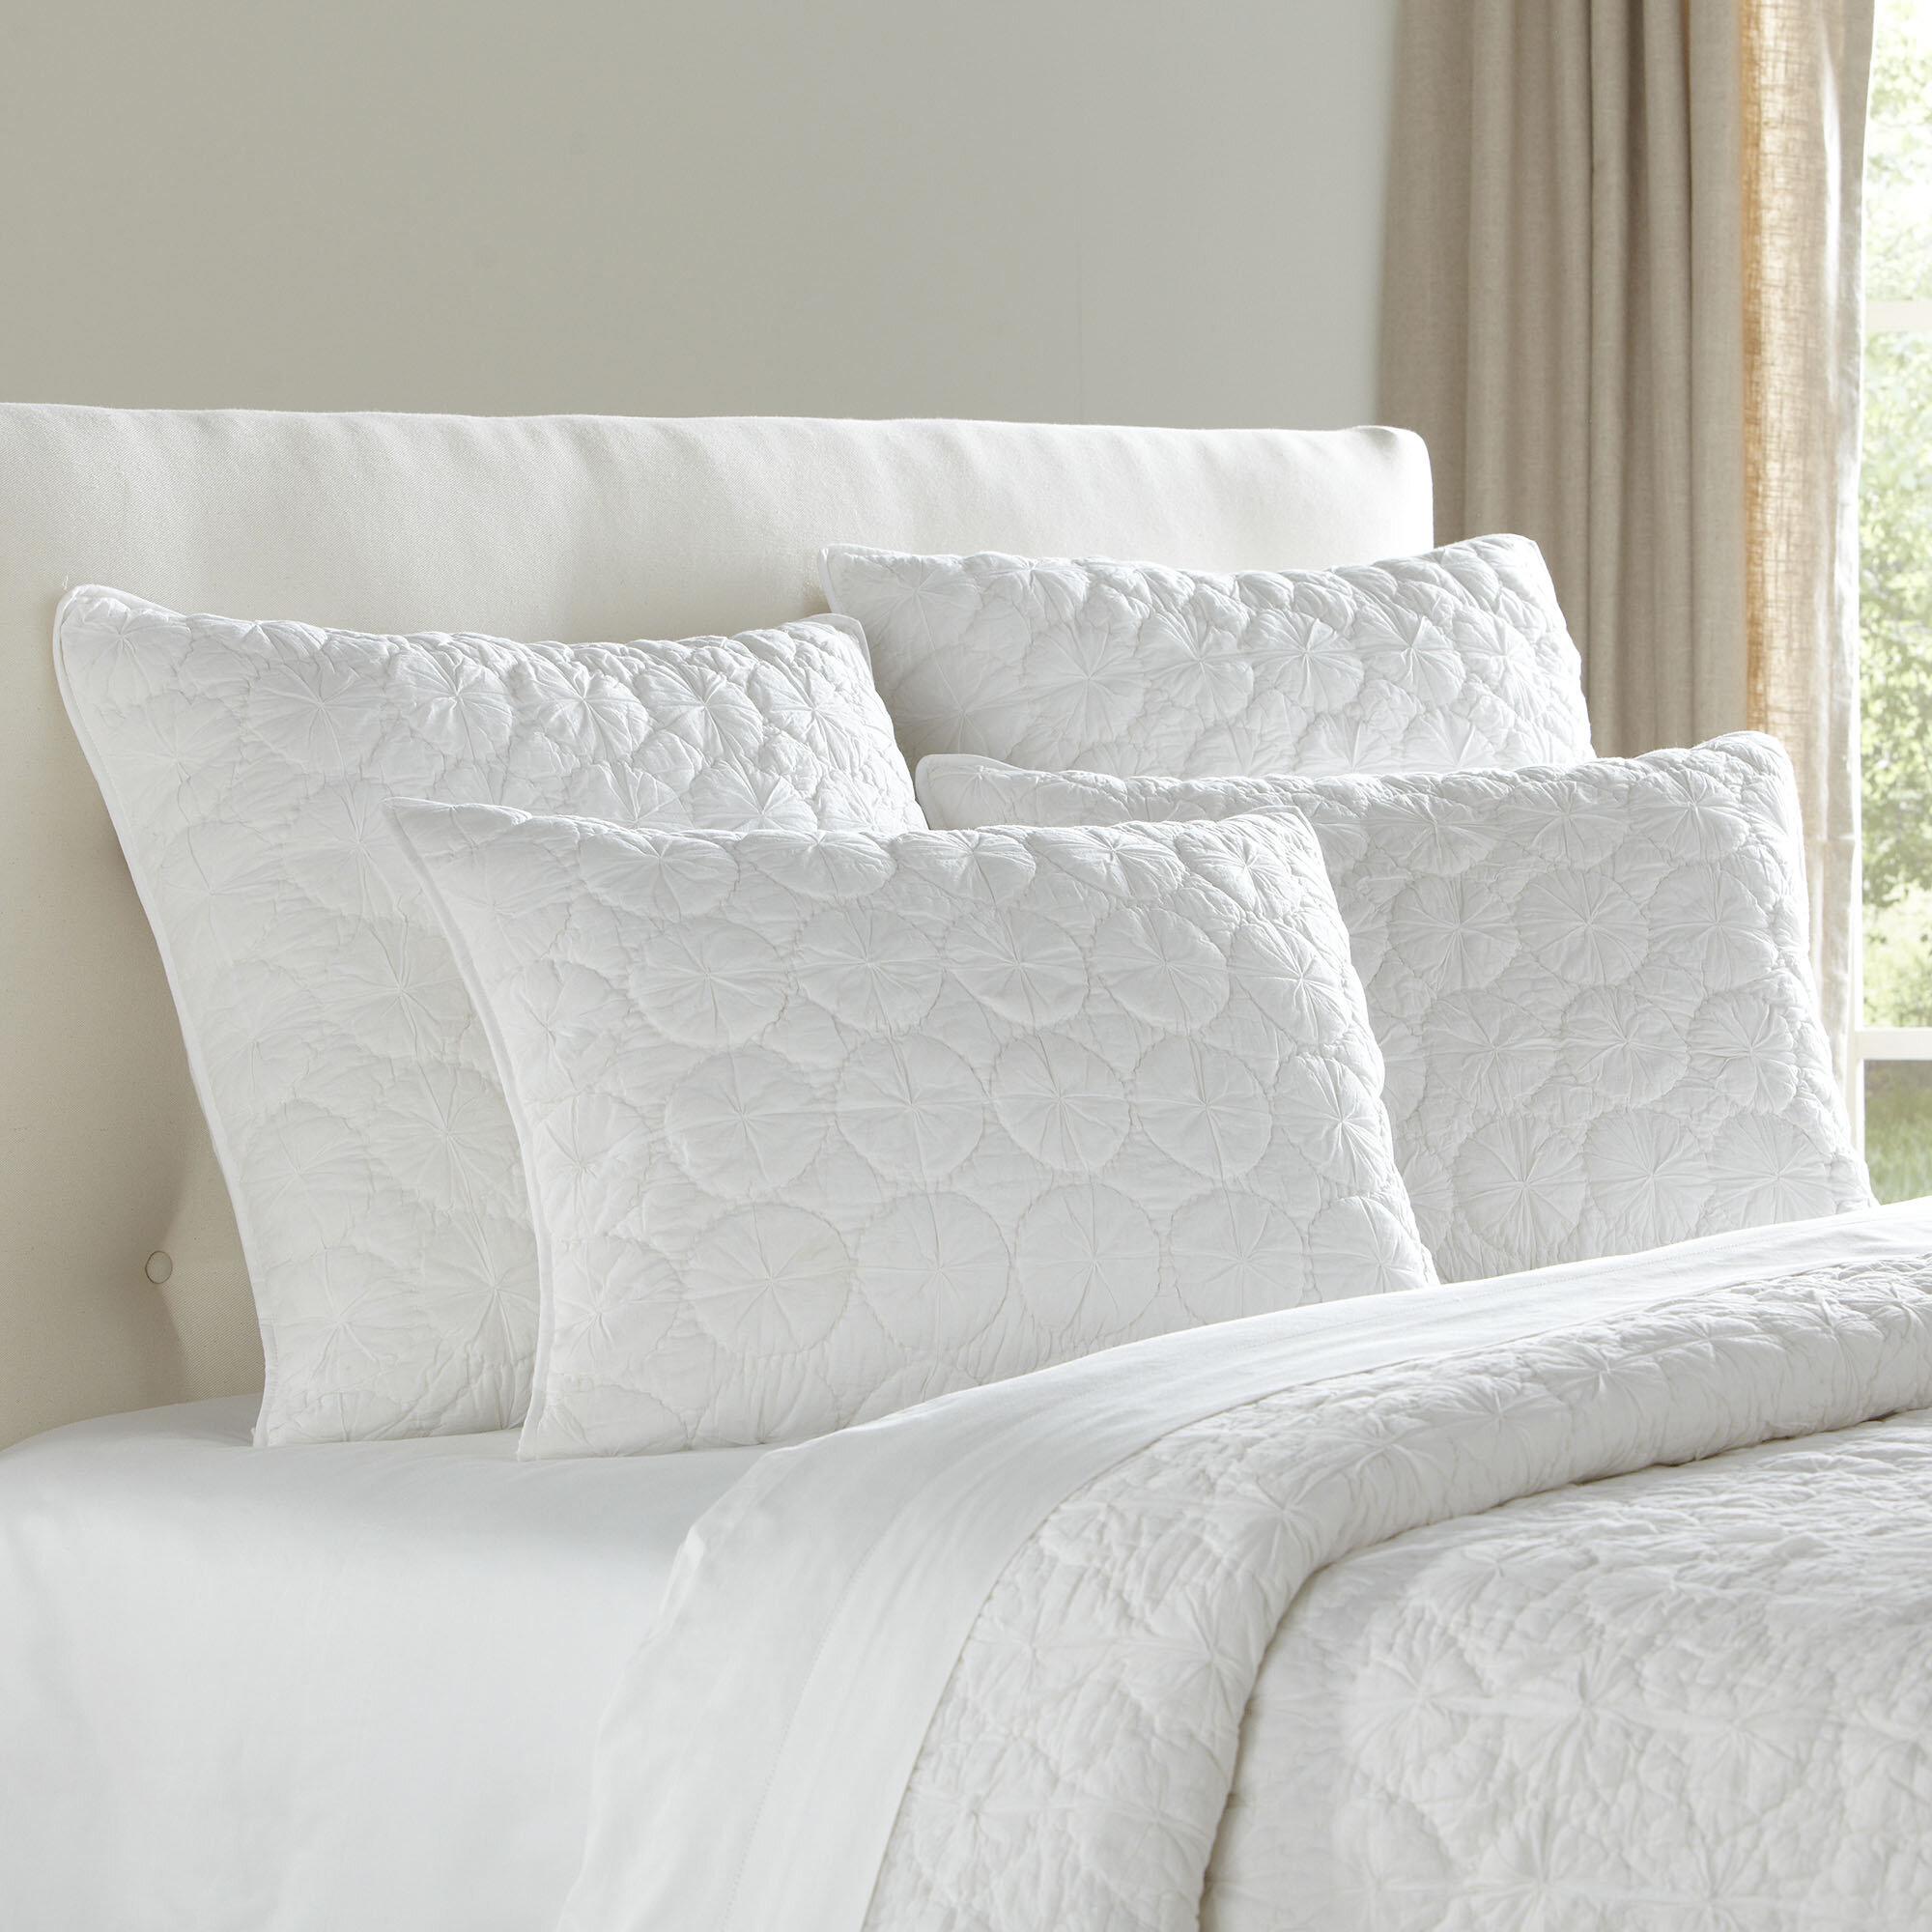 comforter stag santa cover comforters bedding christmas set pillowcase itm multi quilt xmas with tree ski duvet